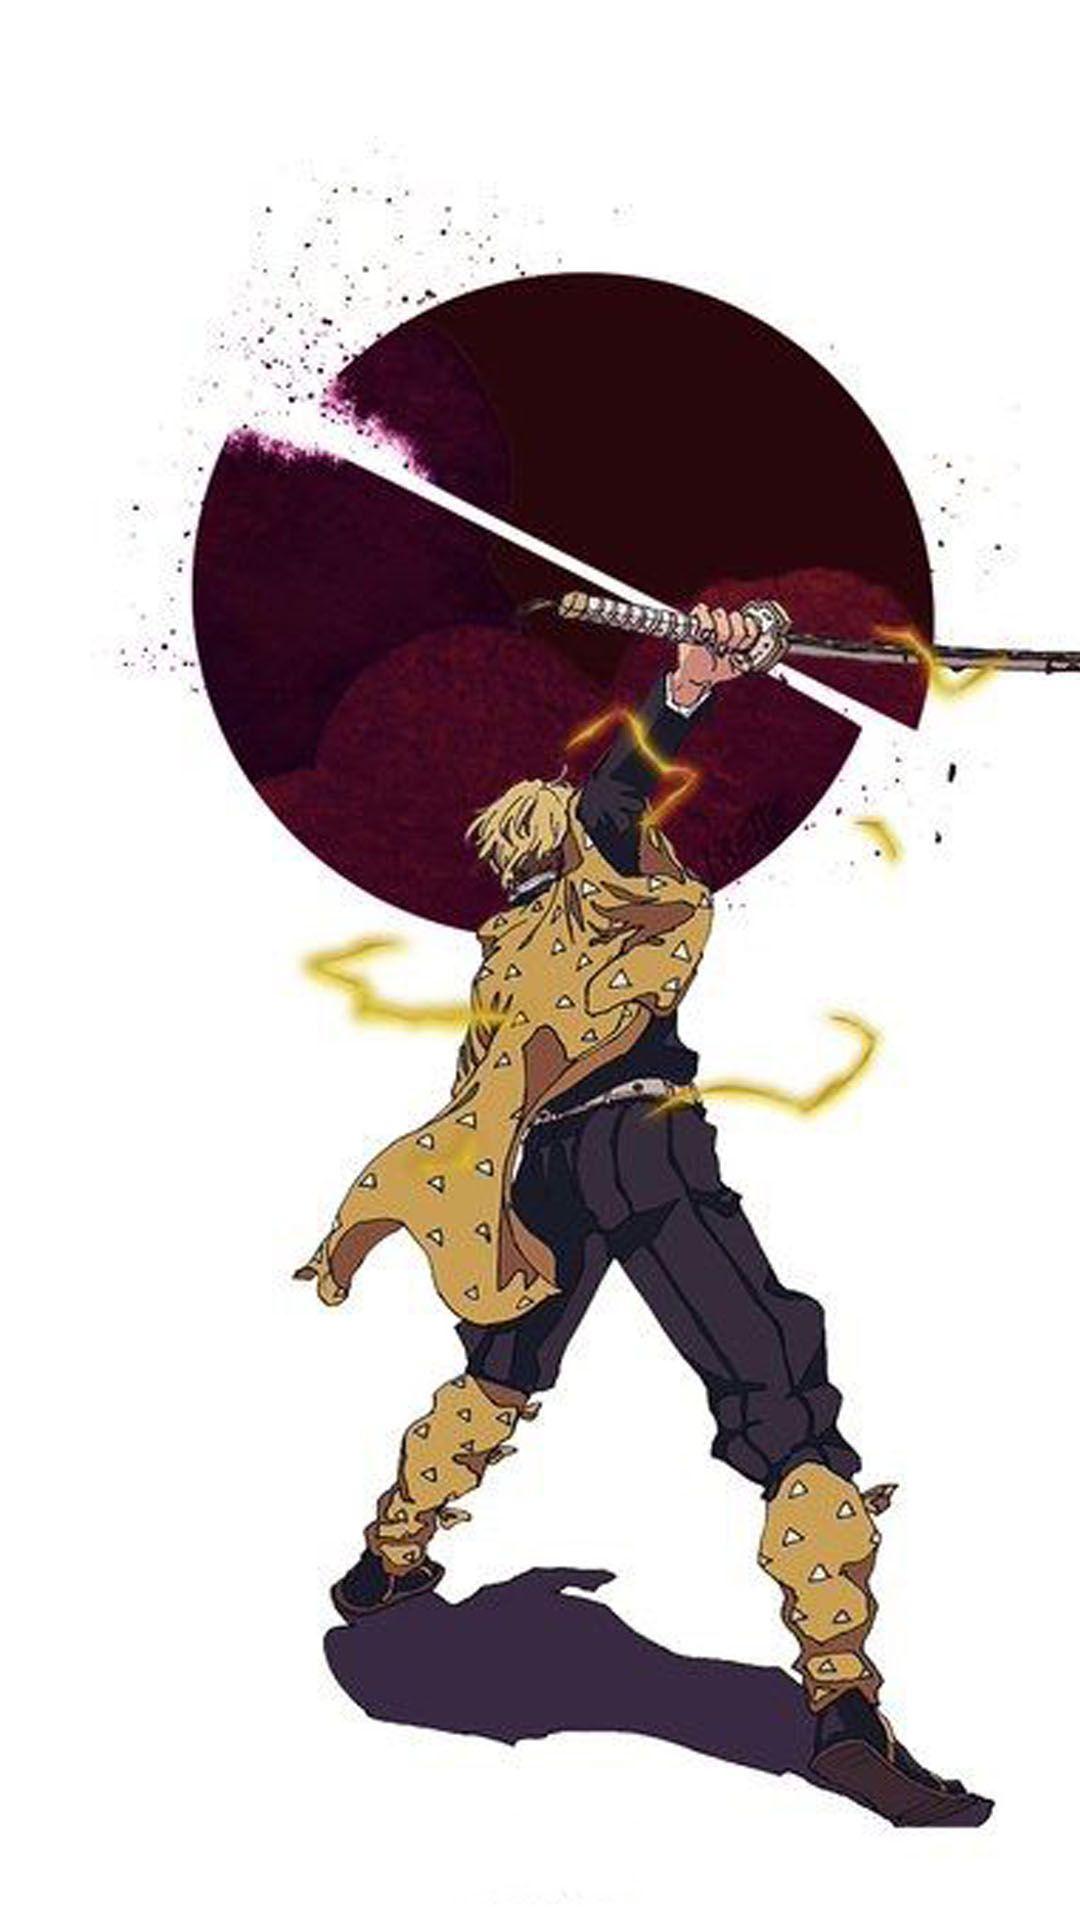 Kimetsu no yaiba Demon Slayer High Quality Wallpaper for